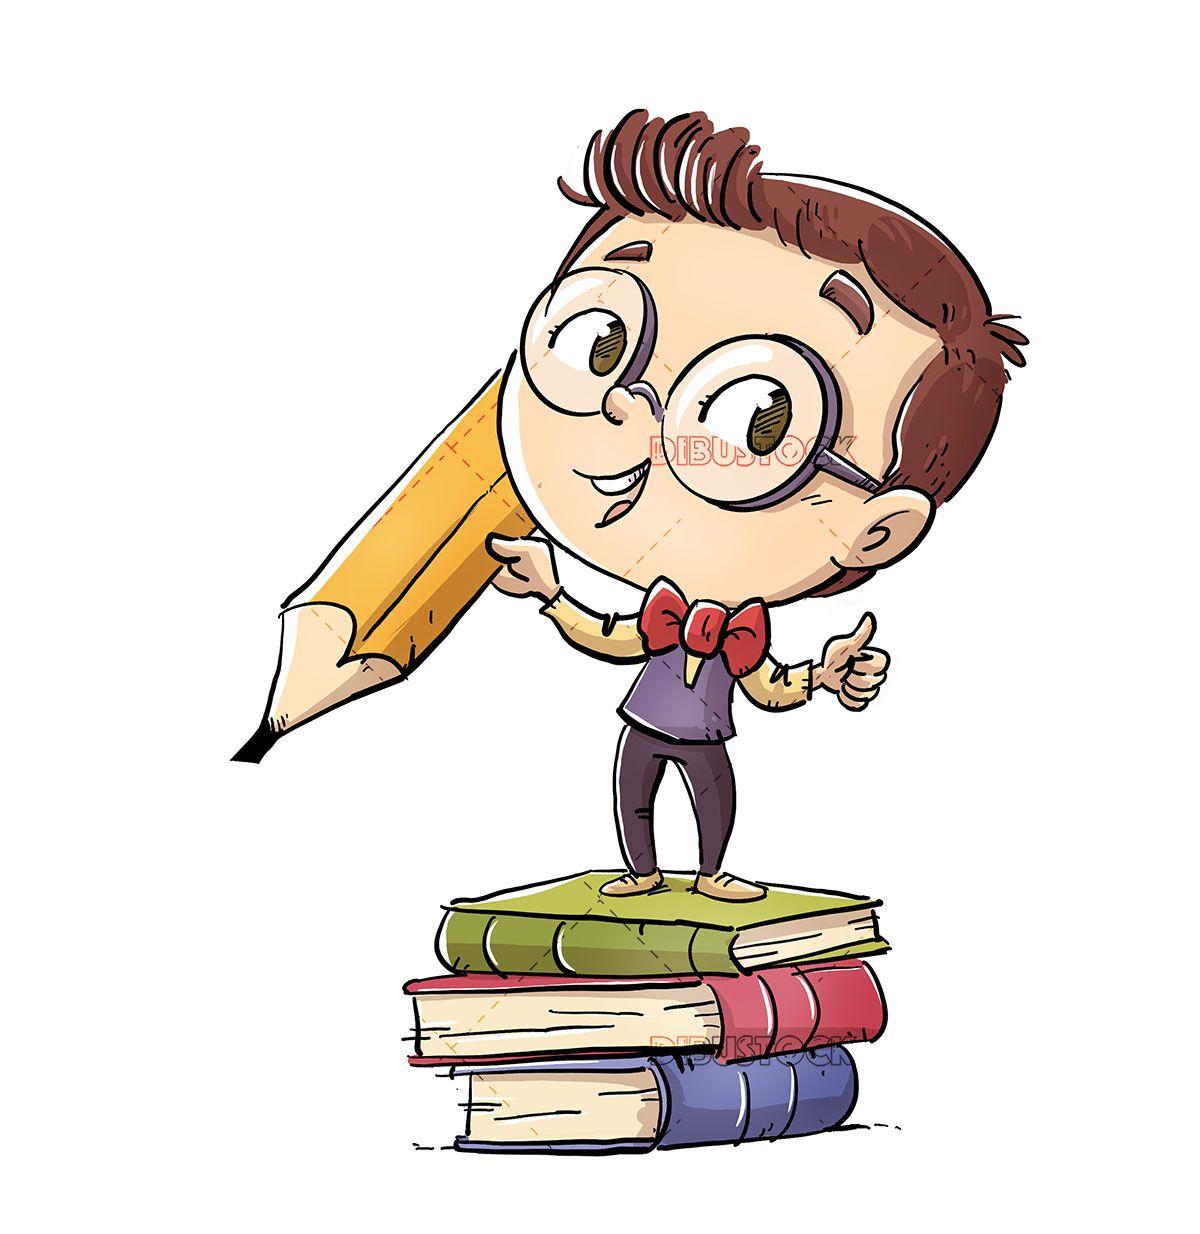 Student Kid With Pencil And Books Multfilmy Multiplikacionnye Risunki Detskij Logotip